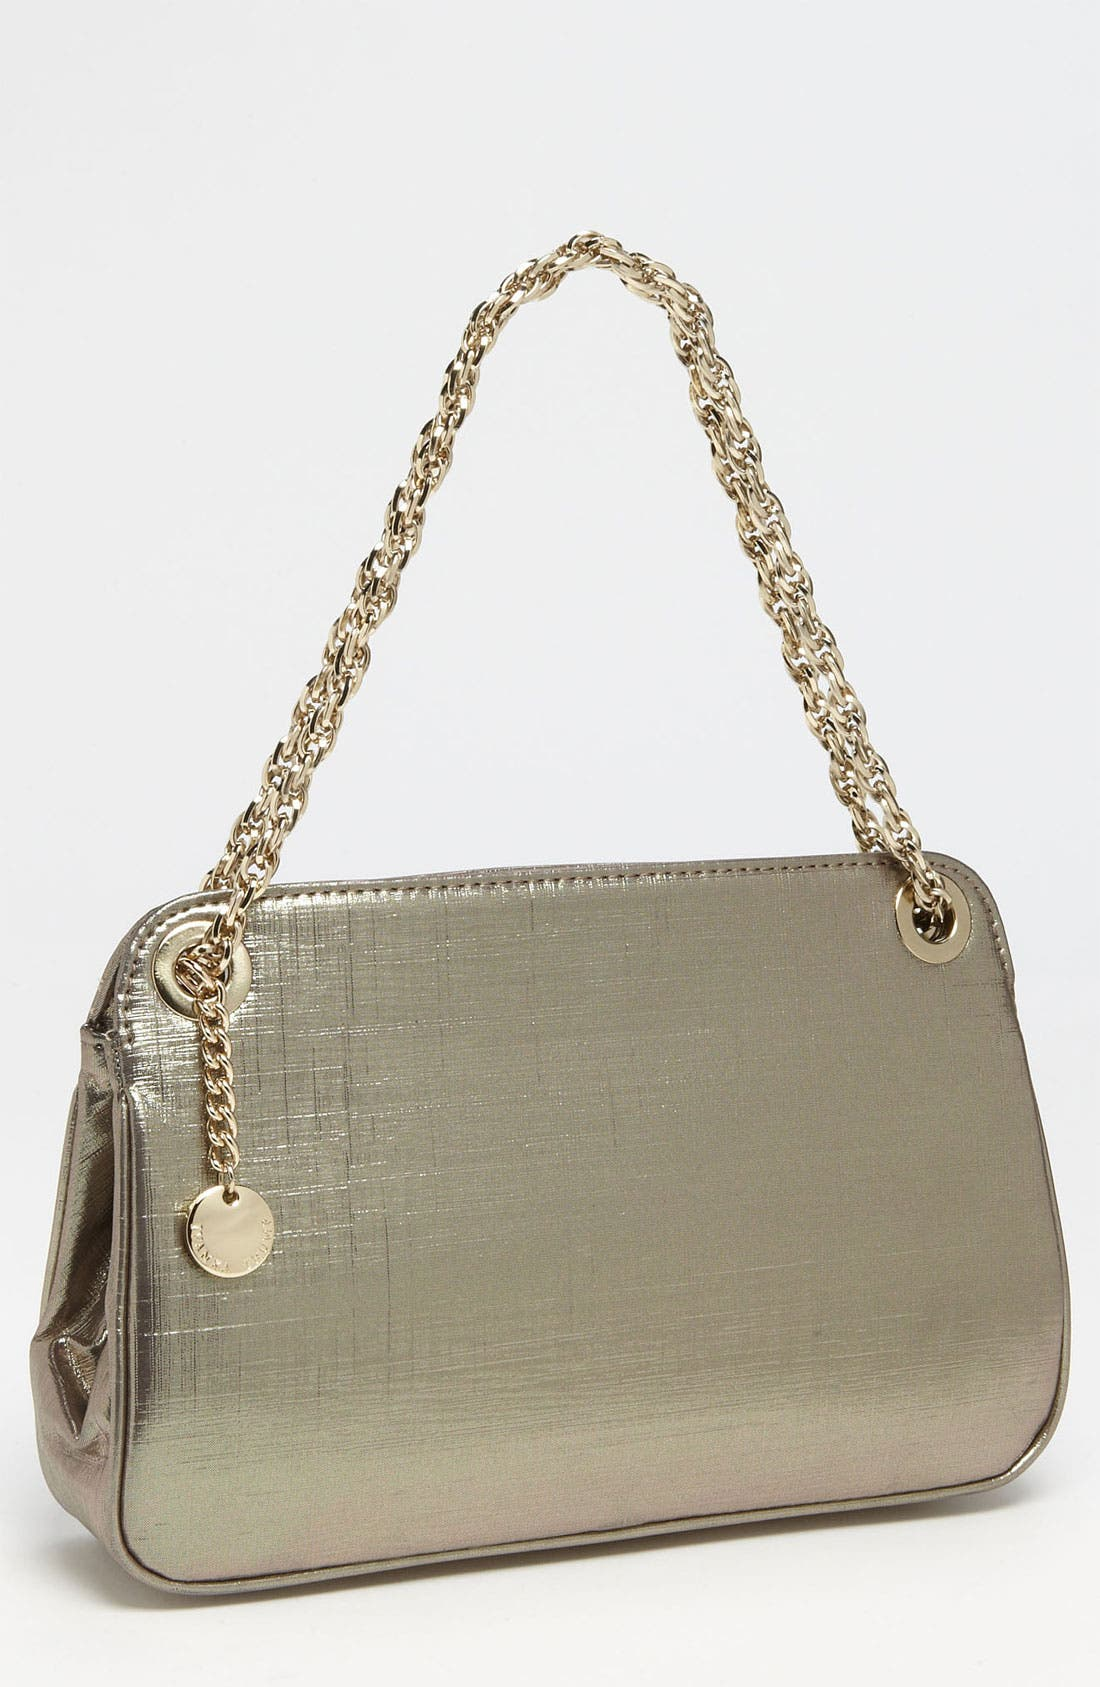 Main Image - Ivanka Trump 'Cynthia' Shoulder Bag